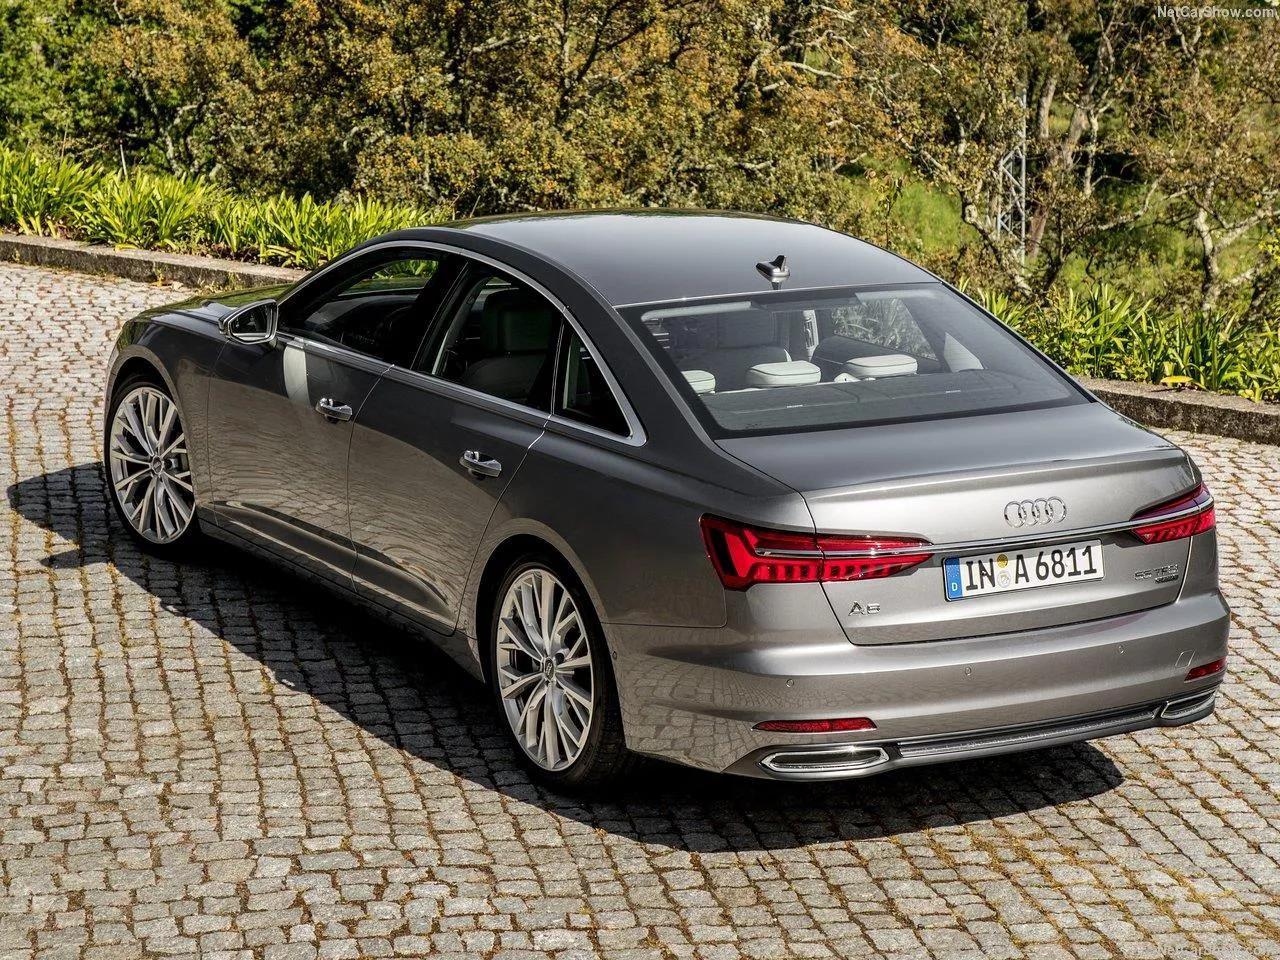 Audi-A6-C8-3-presentation.jpeg